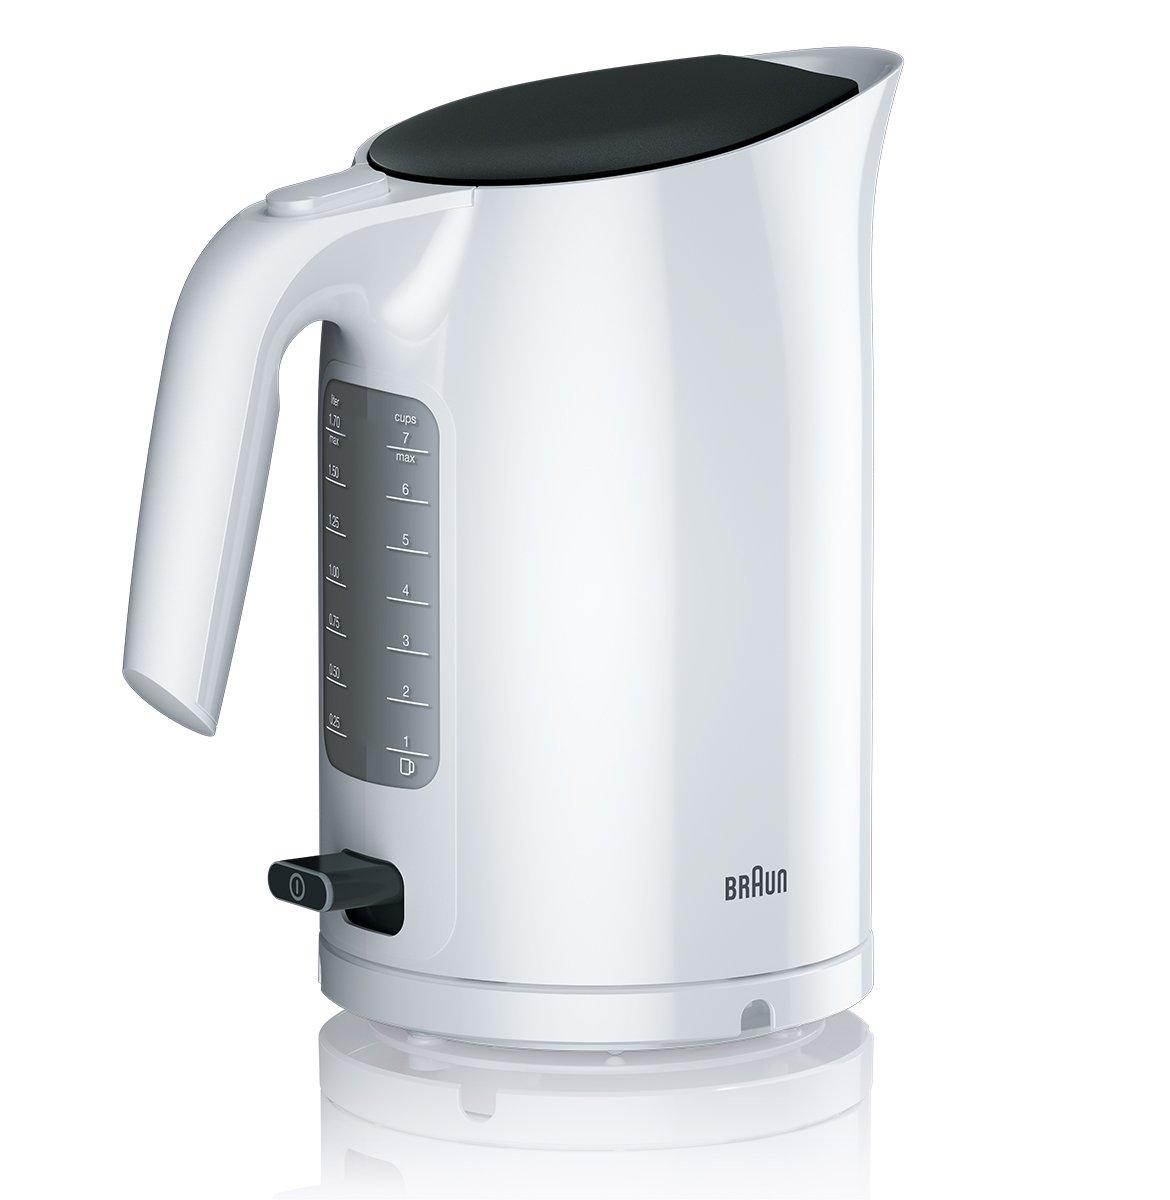 Braun WK 3110/WH Hervidor de agua color blanco